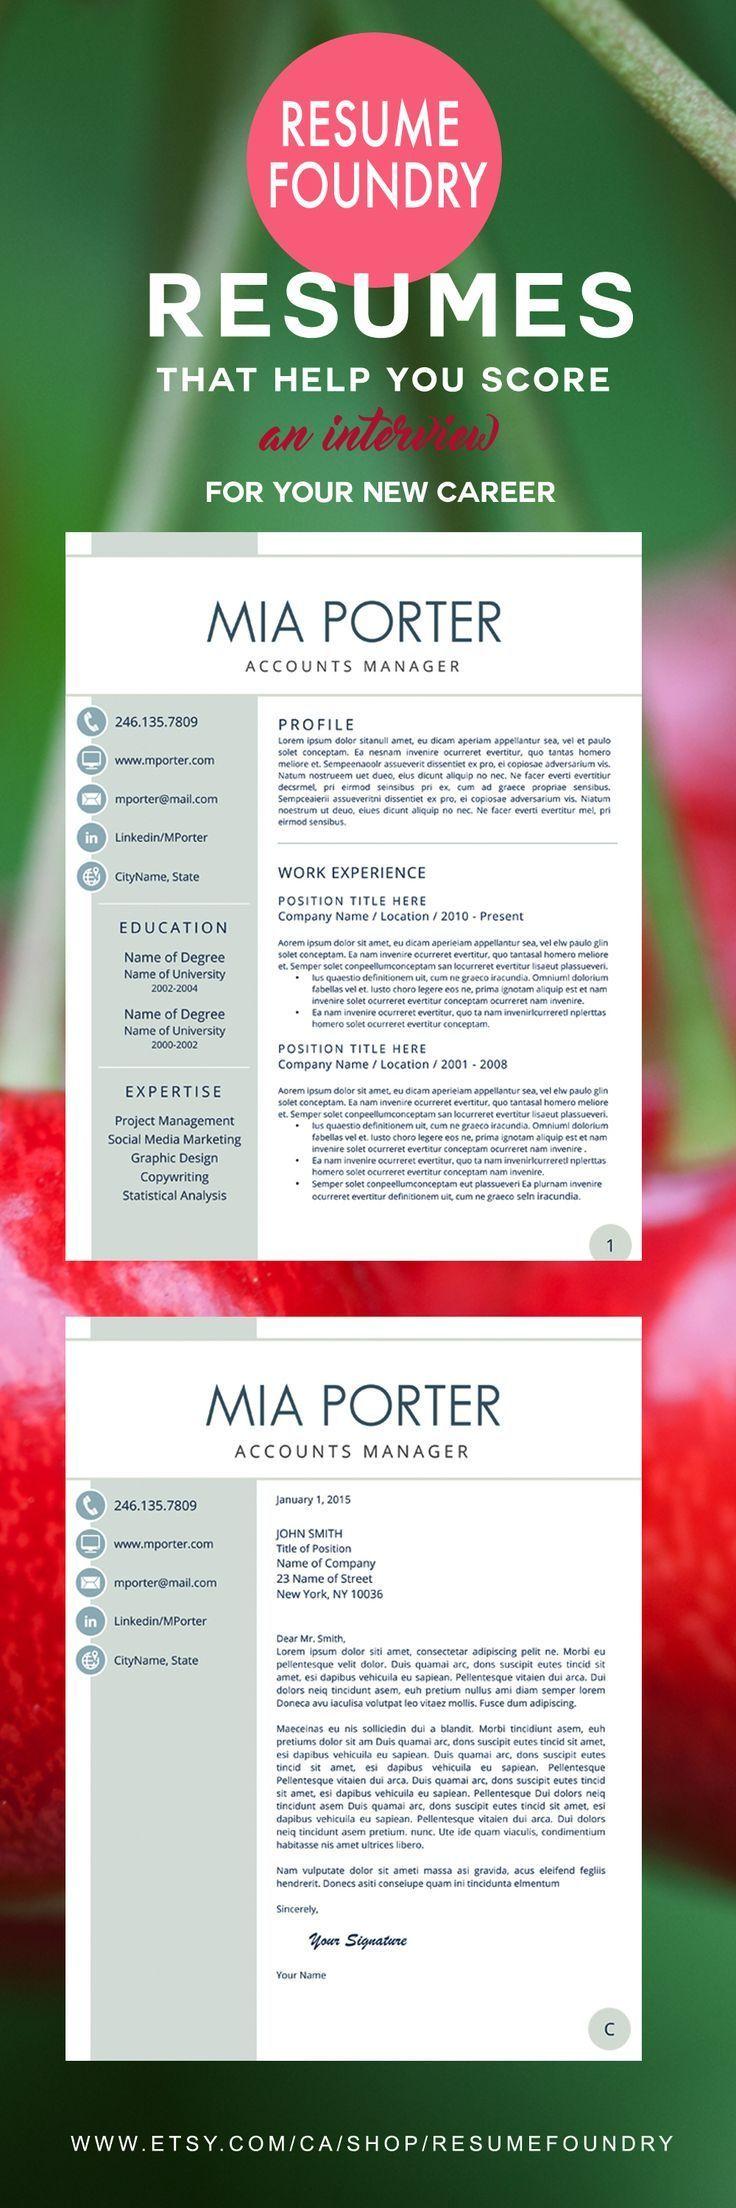 creative resume template for ms word professional resume design modern cv template design instant digital download nelson